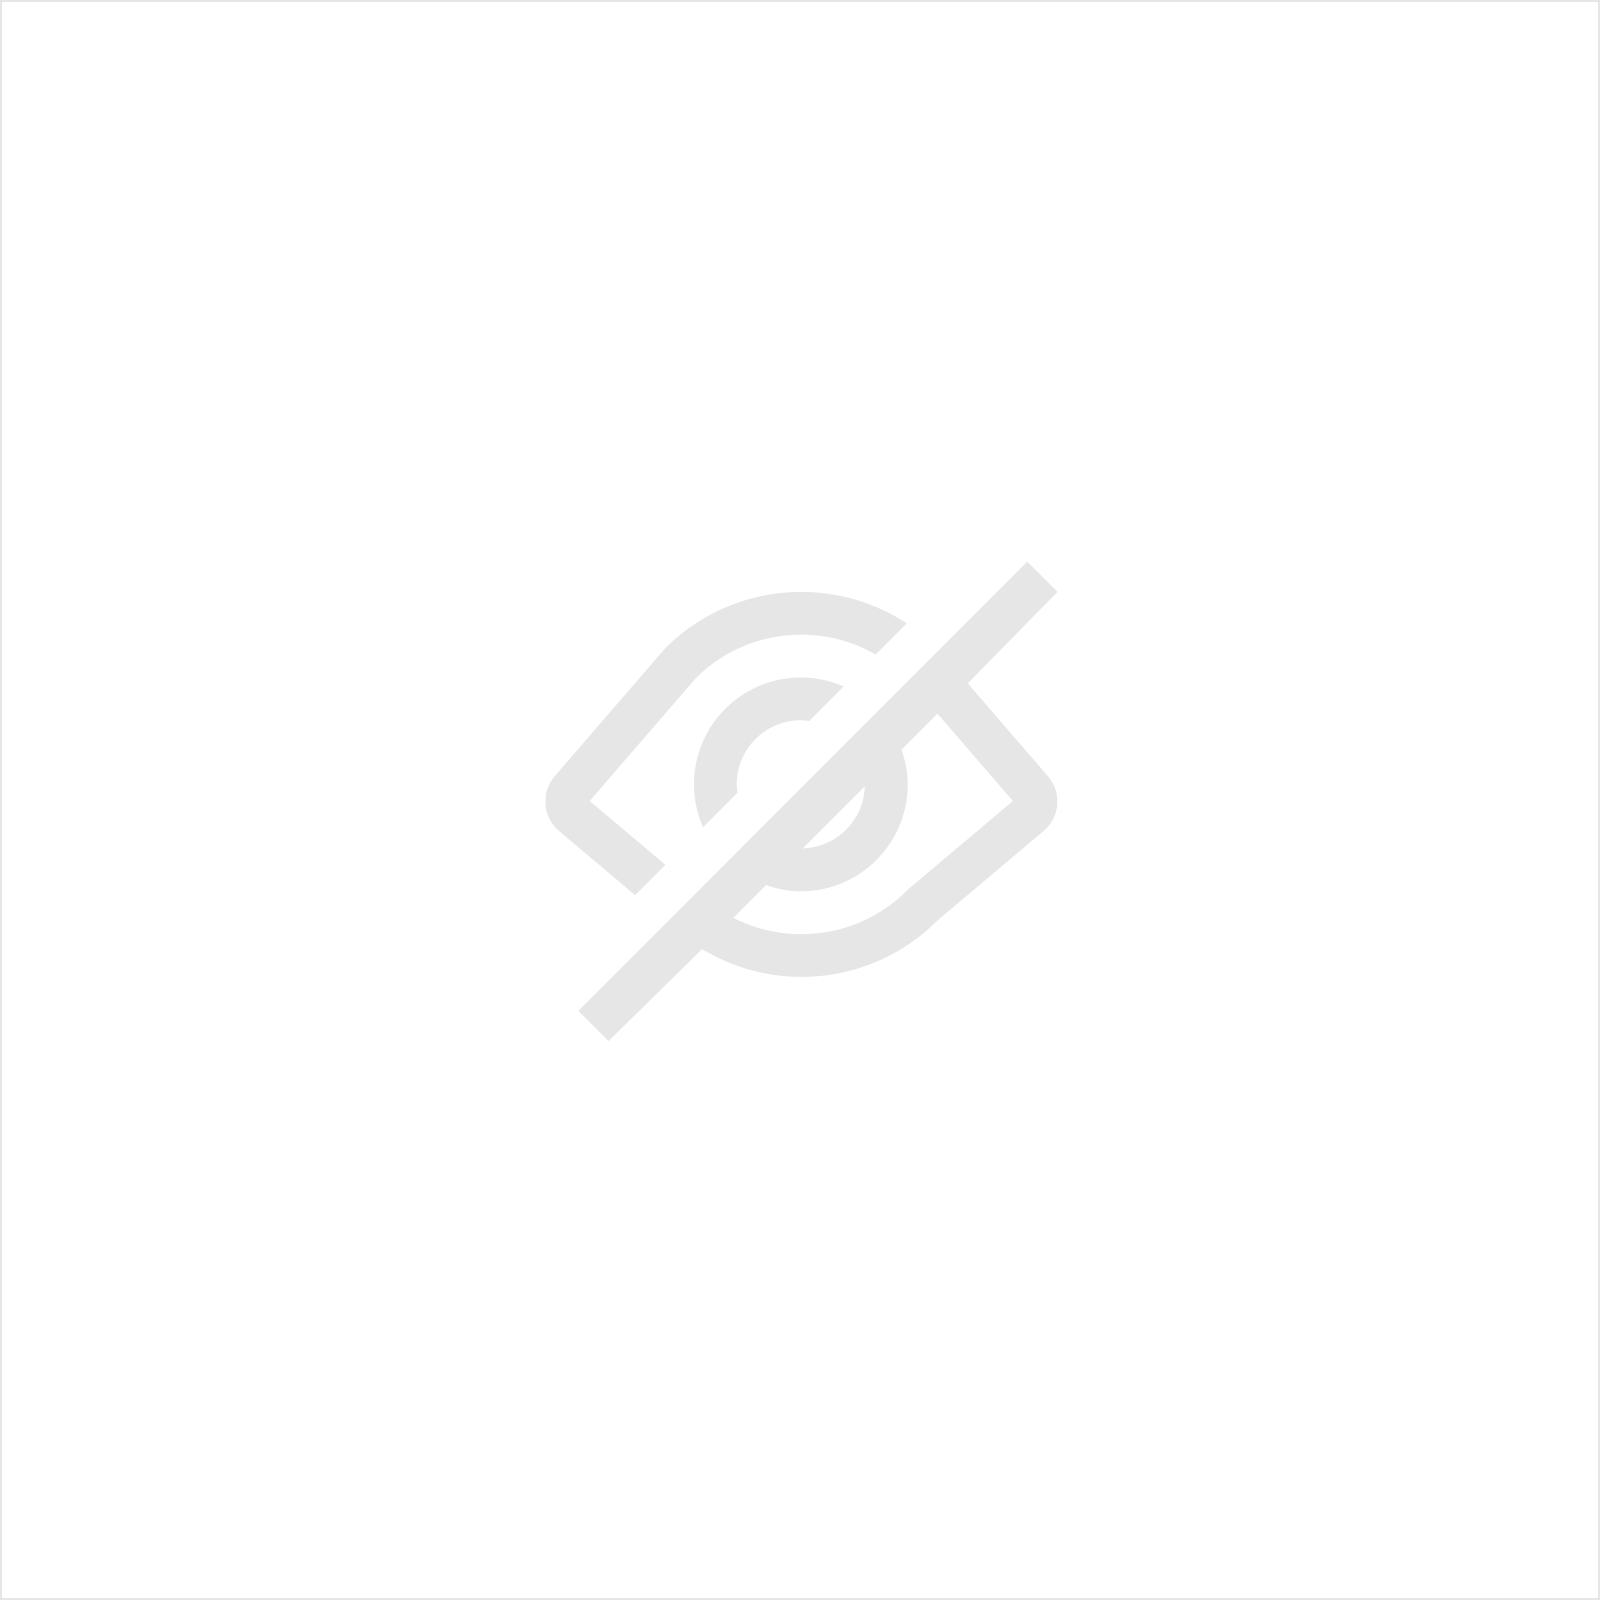 NOVOL - APPRÊT ÉPOXY ISOLANT AVEC ADDITIFS ANTI-CORROSION - 2,5 L